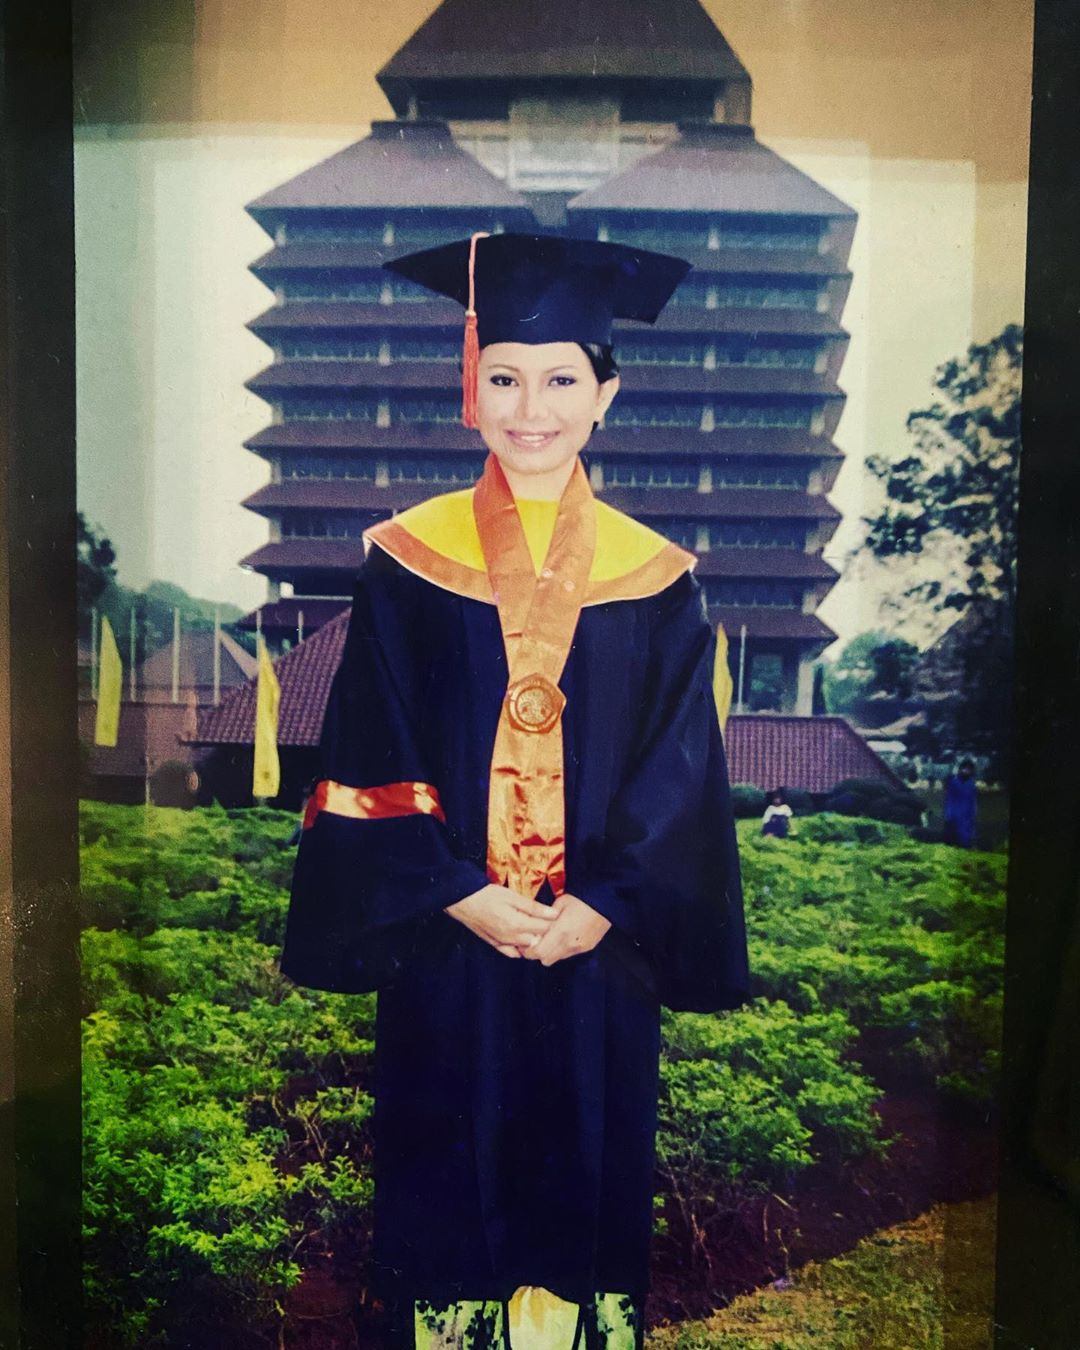 Najwa Shihab Hingga Maudy Ayunda, 12 Artis Ini Ramaikan #WisudaLDR2020